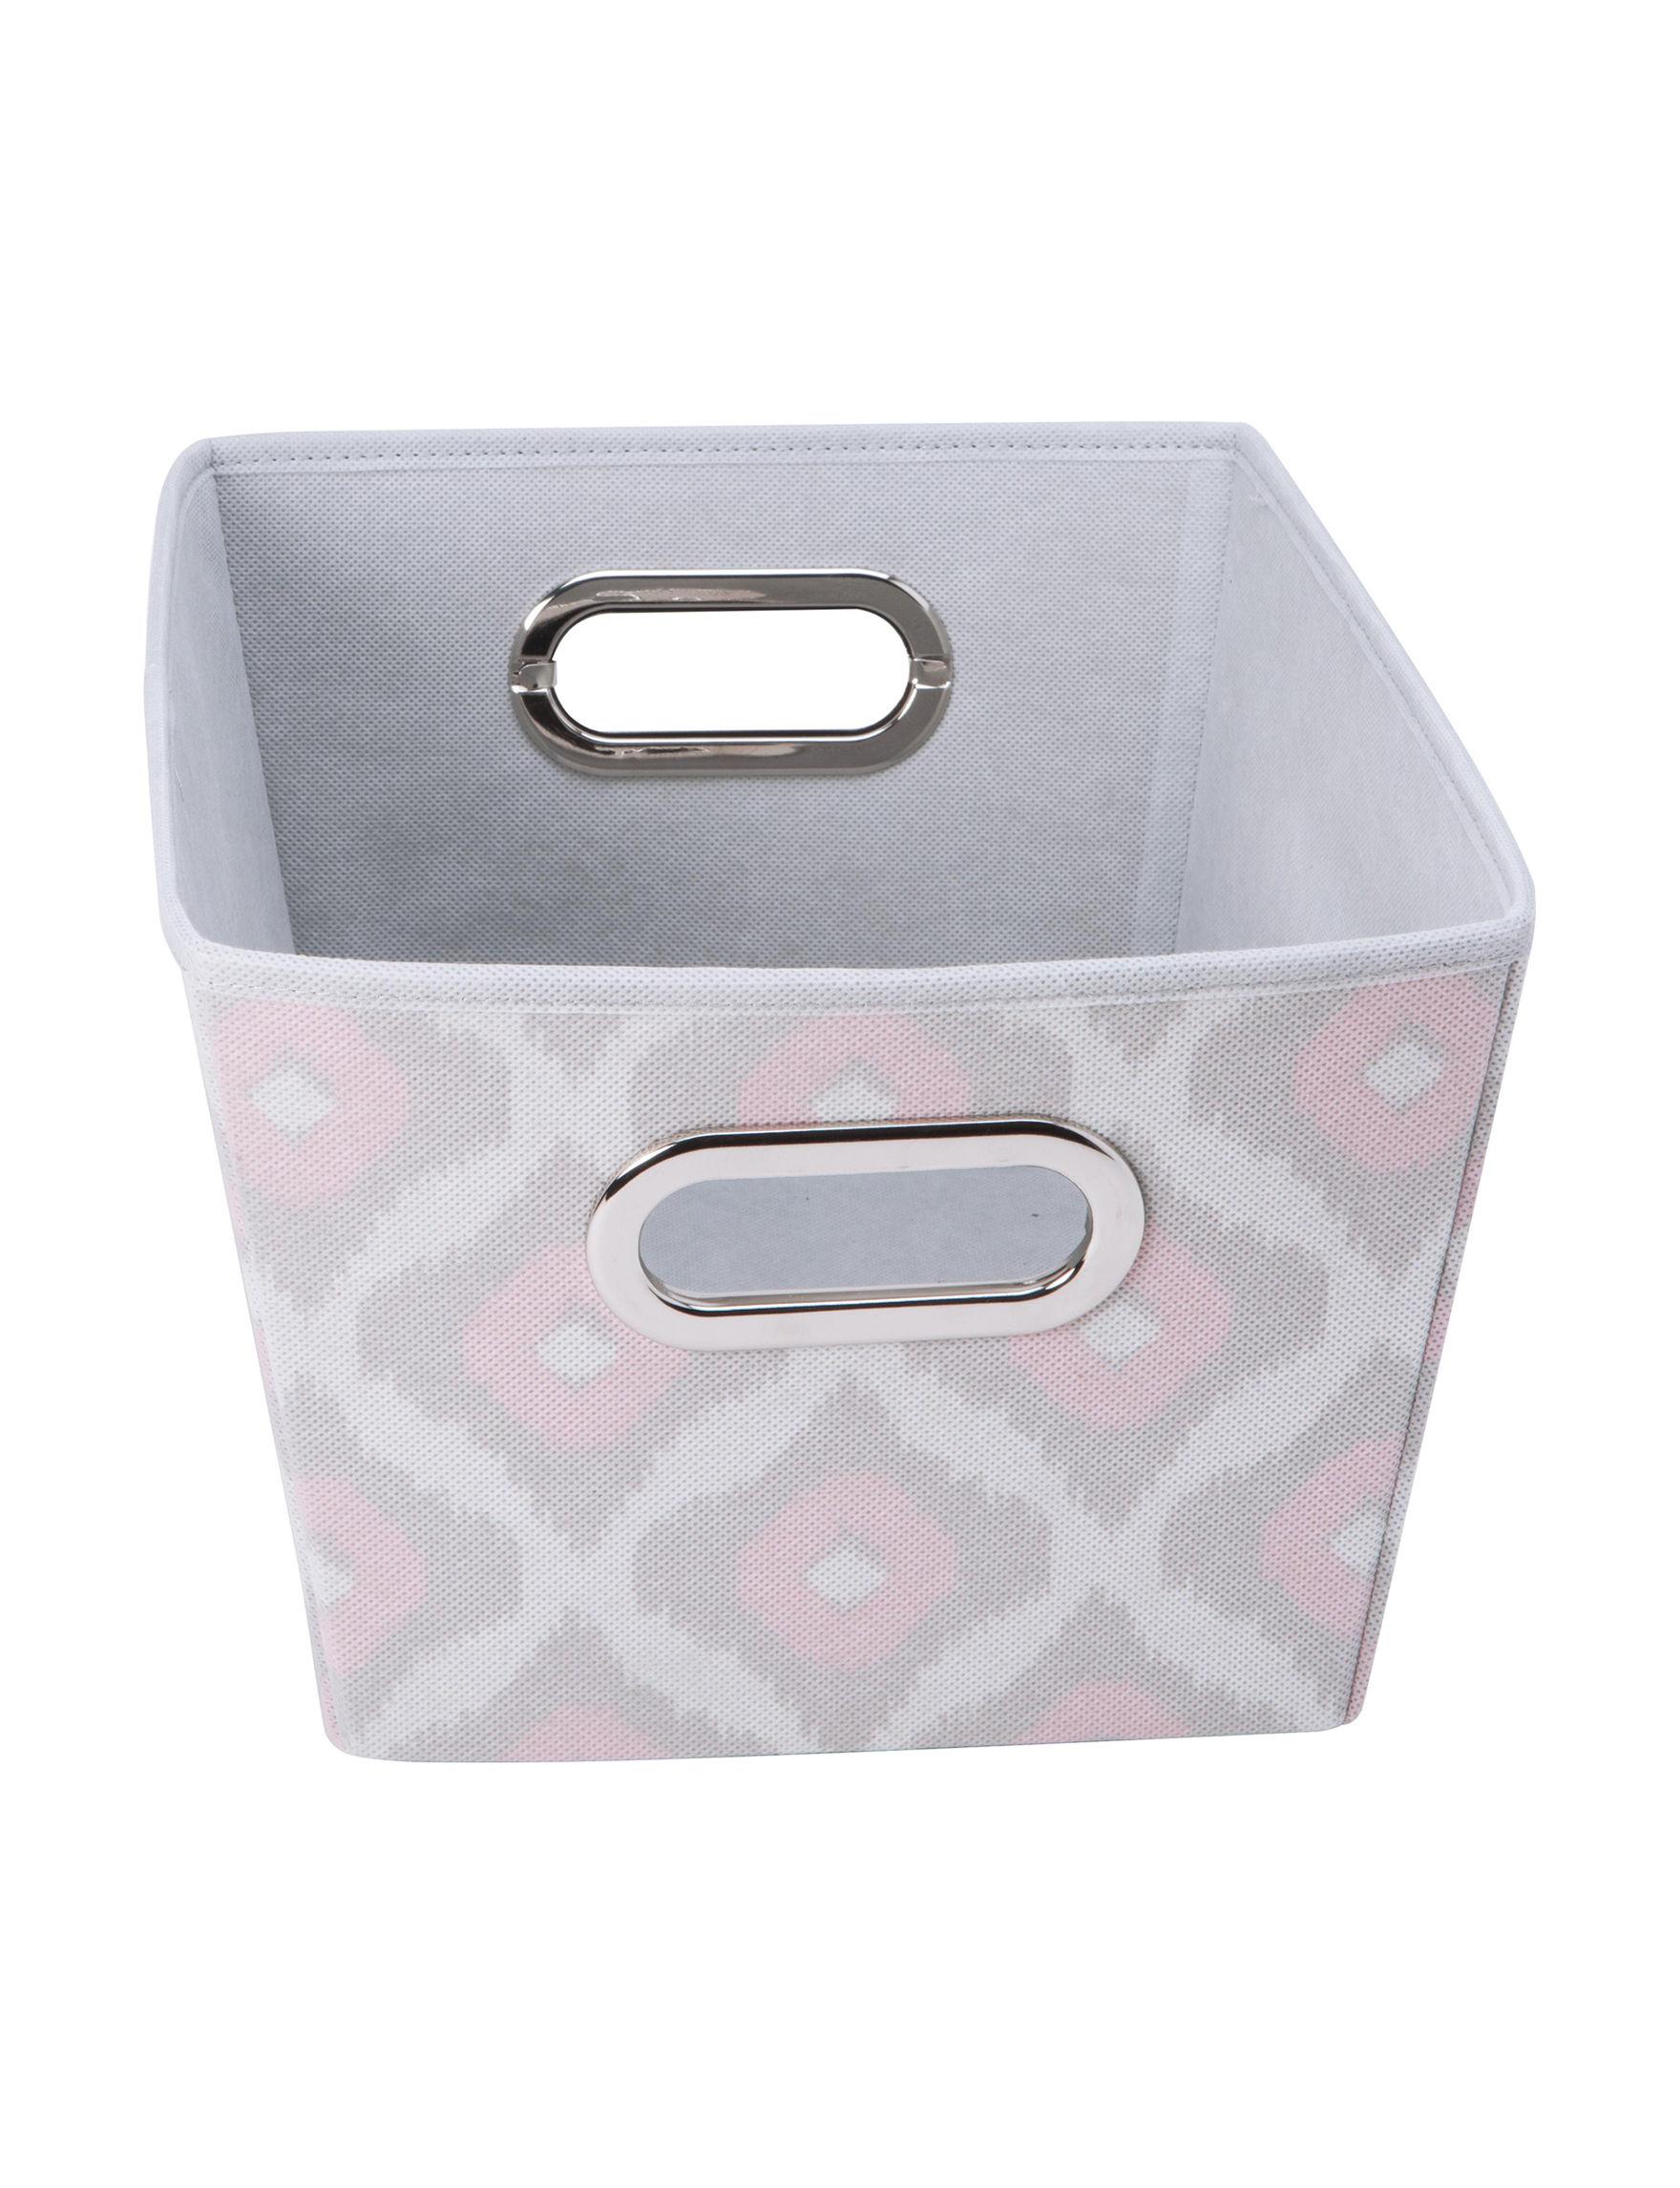 Laura Ashley Grey / Pink Storage & Organization